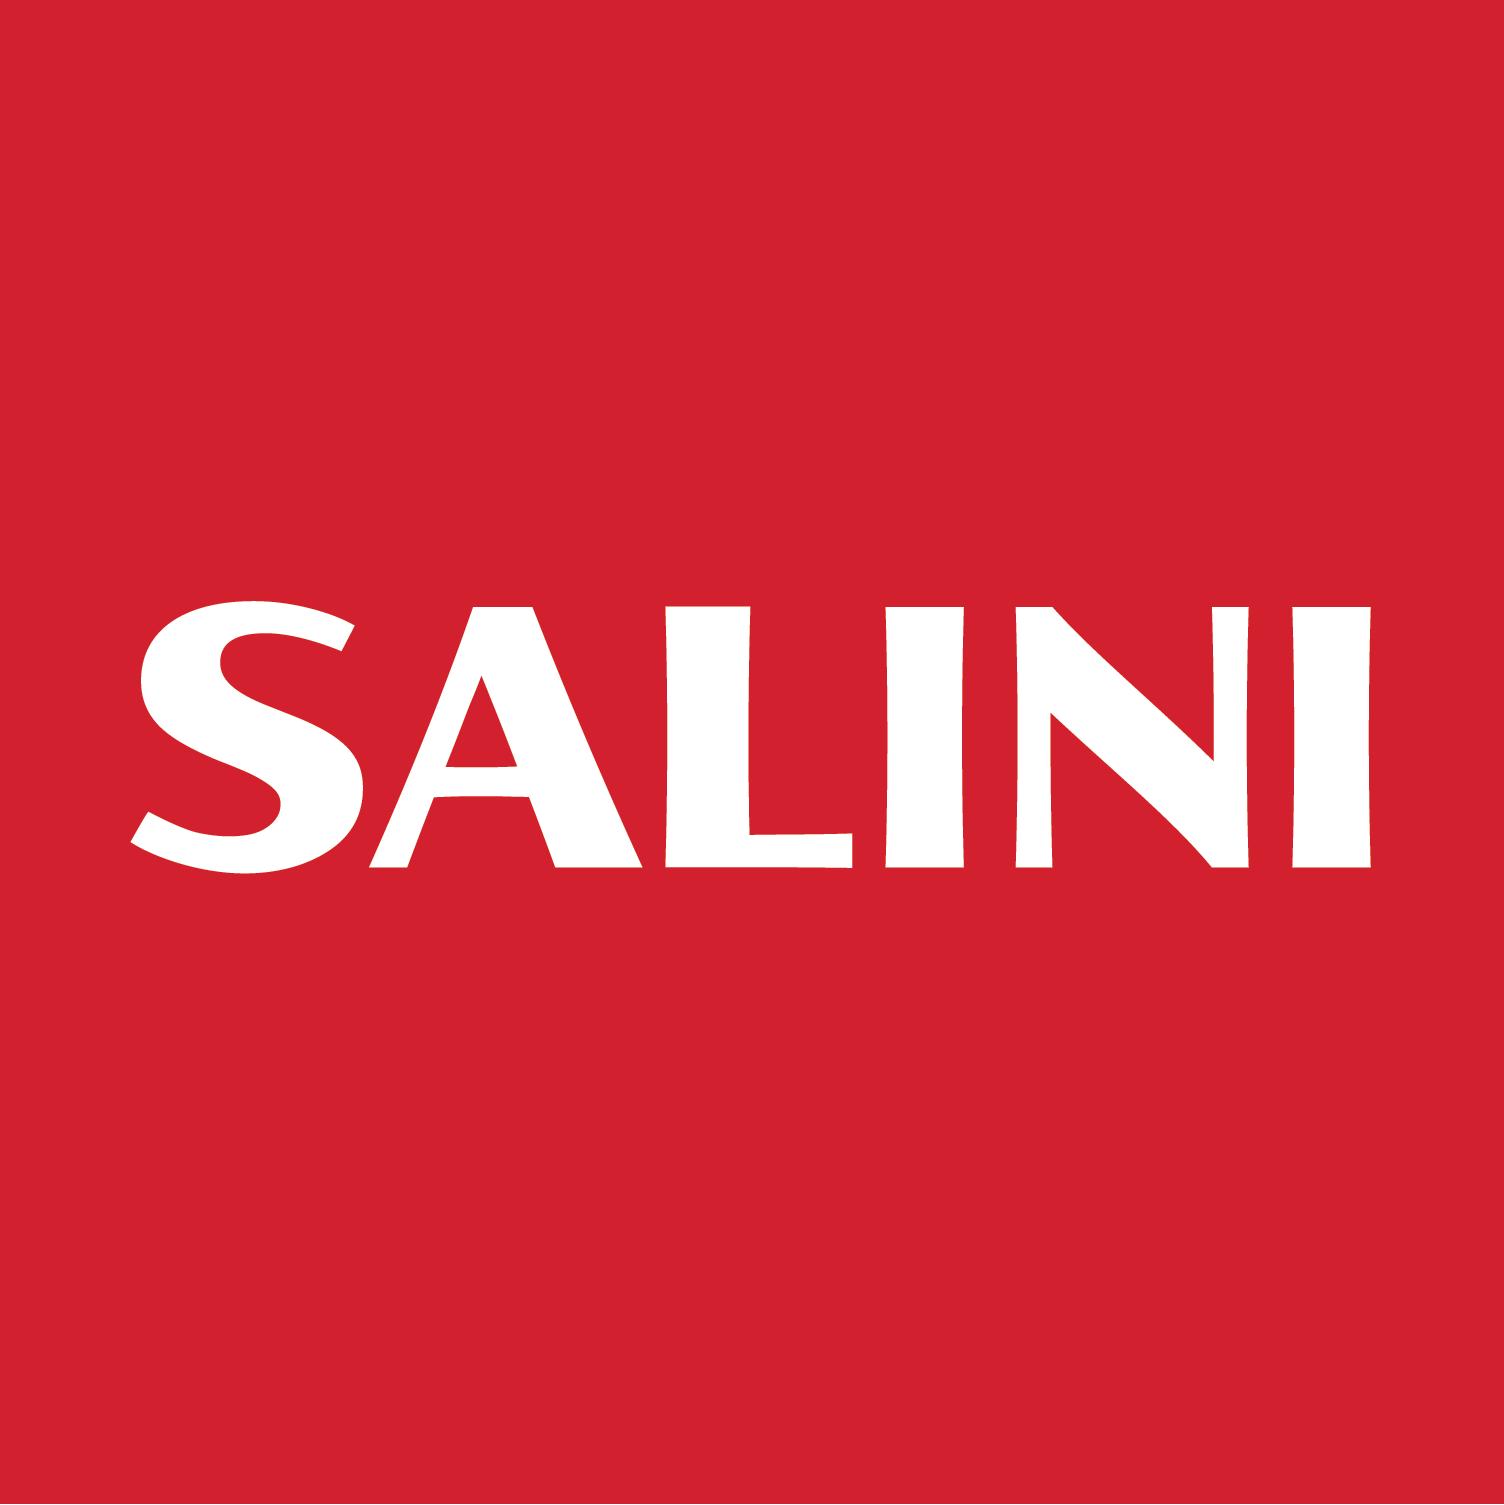 SALINI Appliances